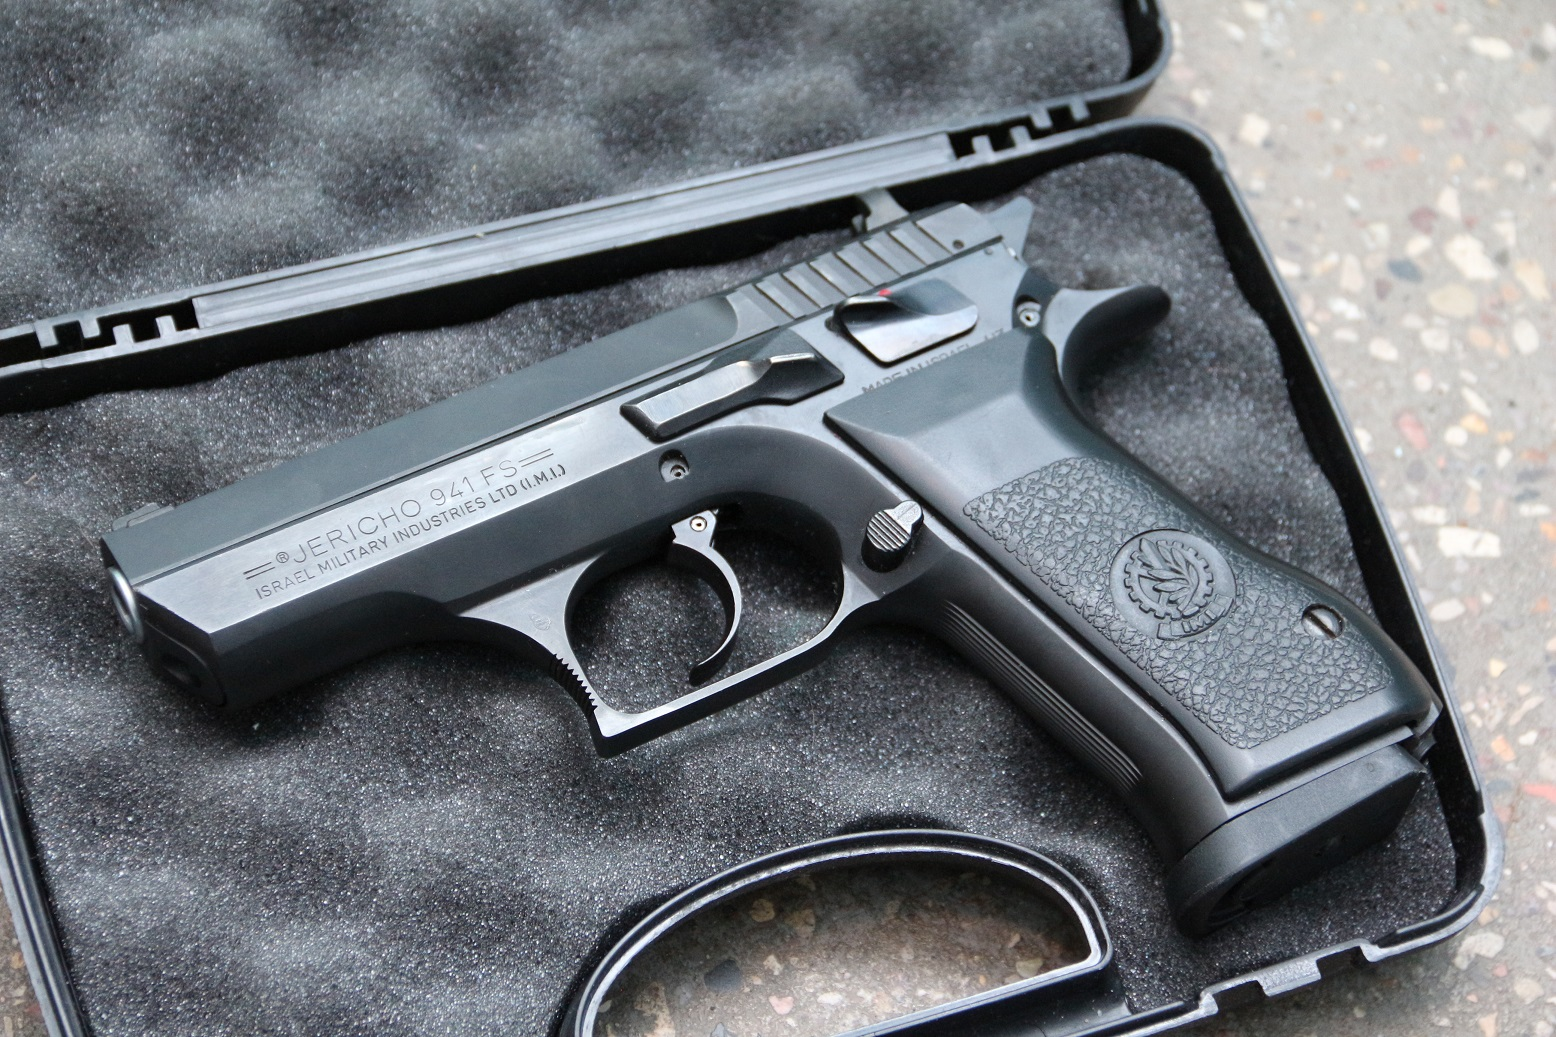 Пистолет Jericho 941FS #F10431, Израиль